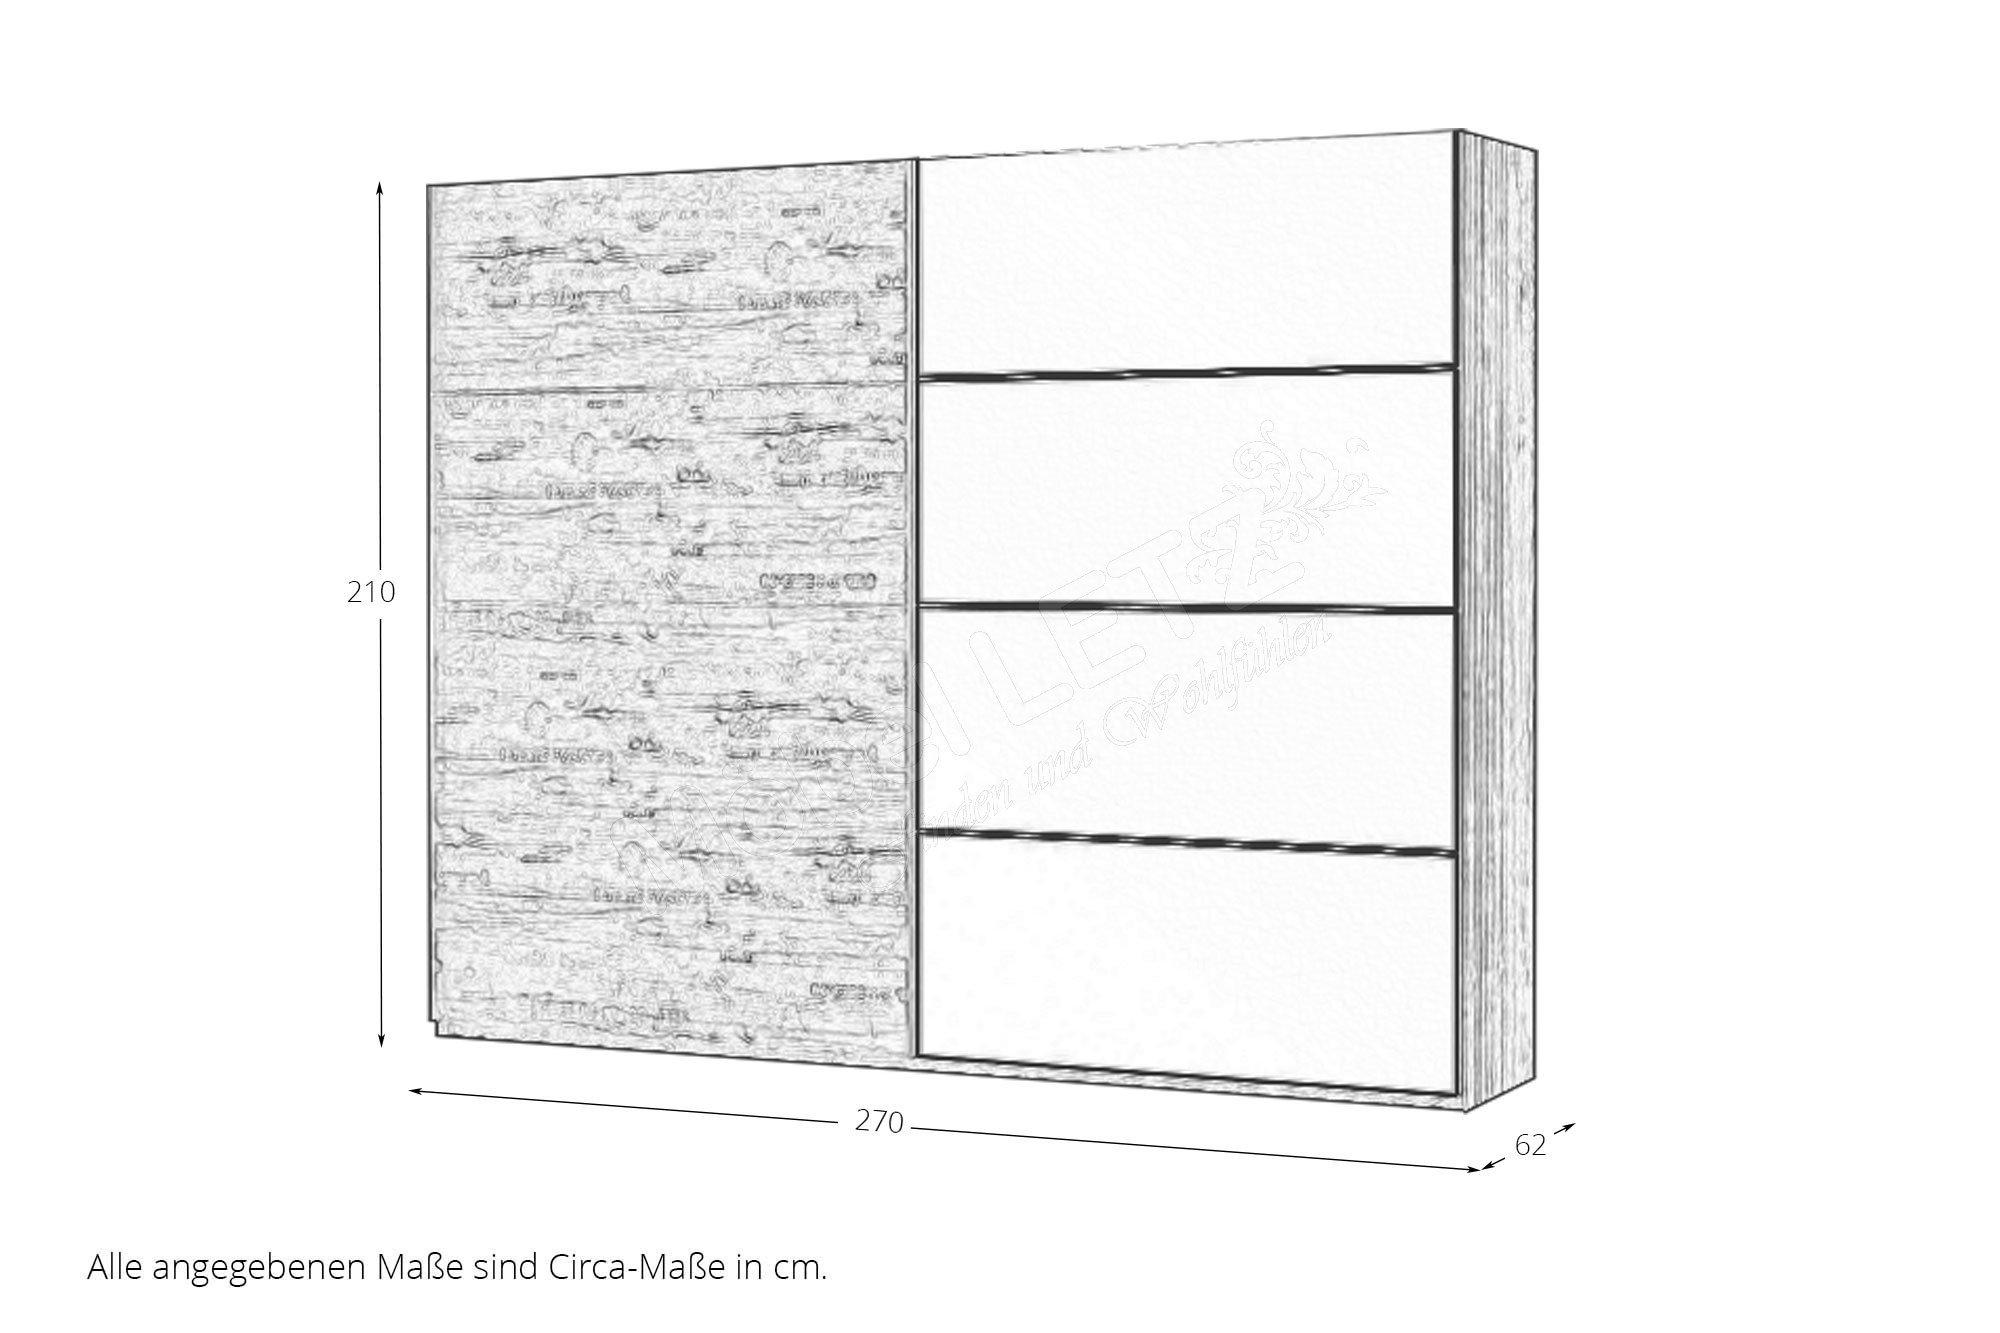 forte schlafzimmer jacky vintage schriftdruck m bel letz ihr online shop. Black Bedroom Furniture Sets. Home Design Ideas